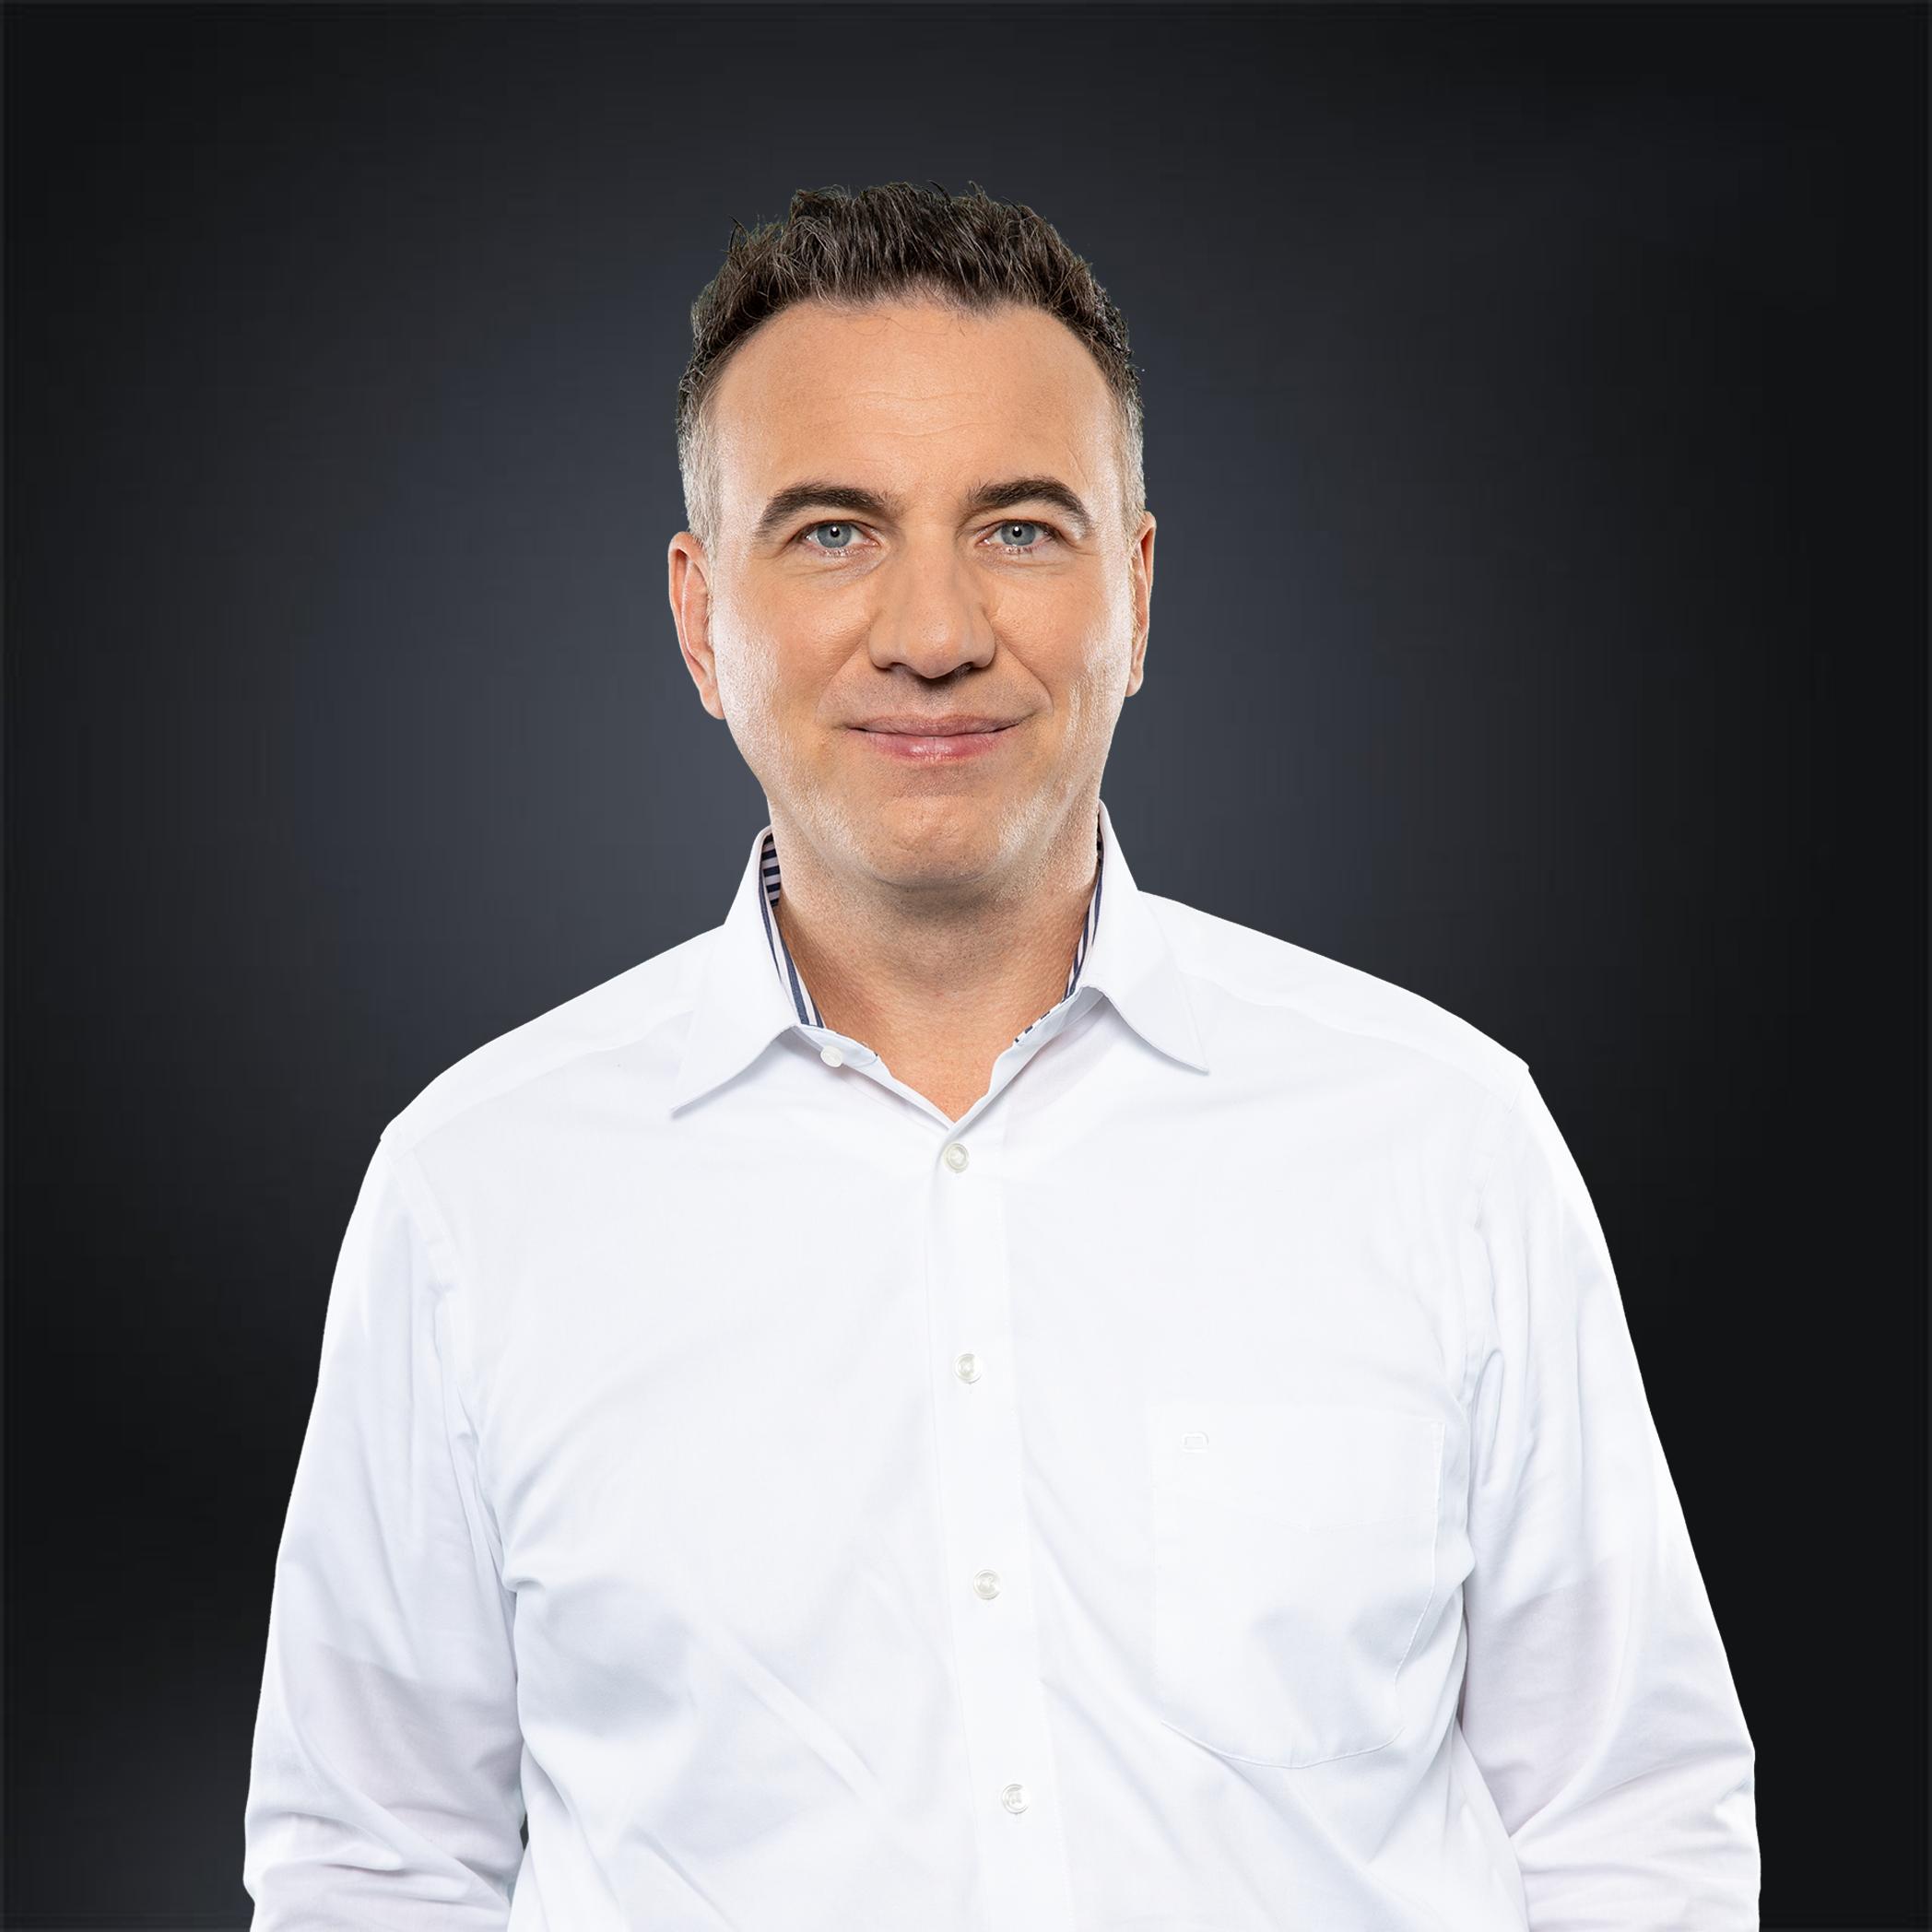 Vorstand SYNO AG | Patrick Deecke